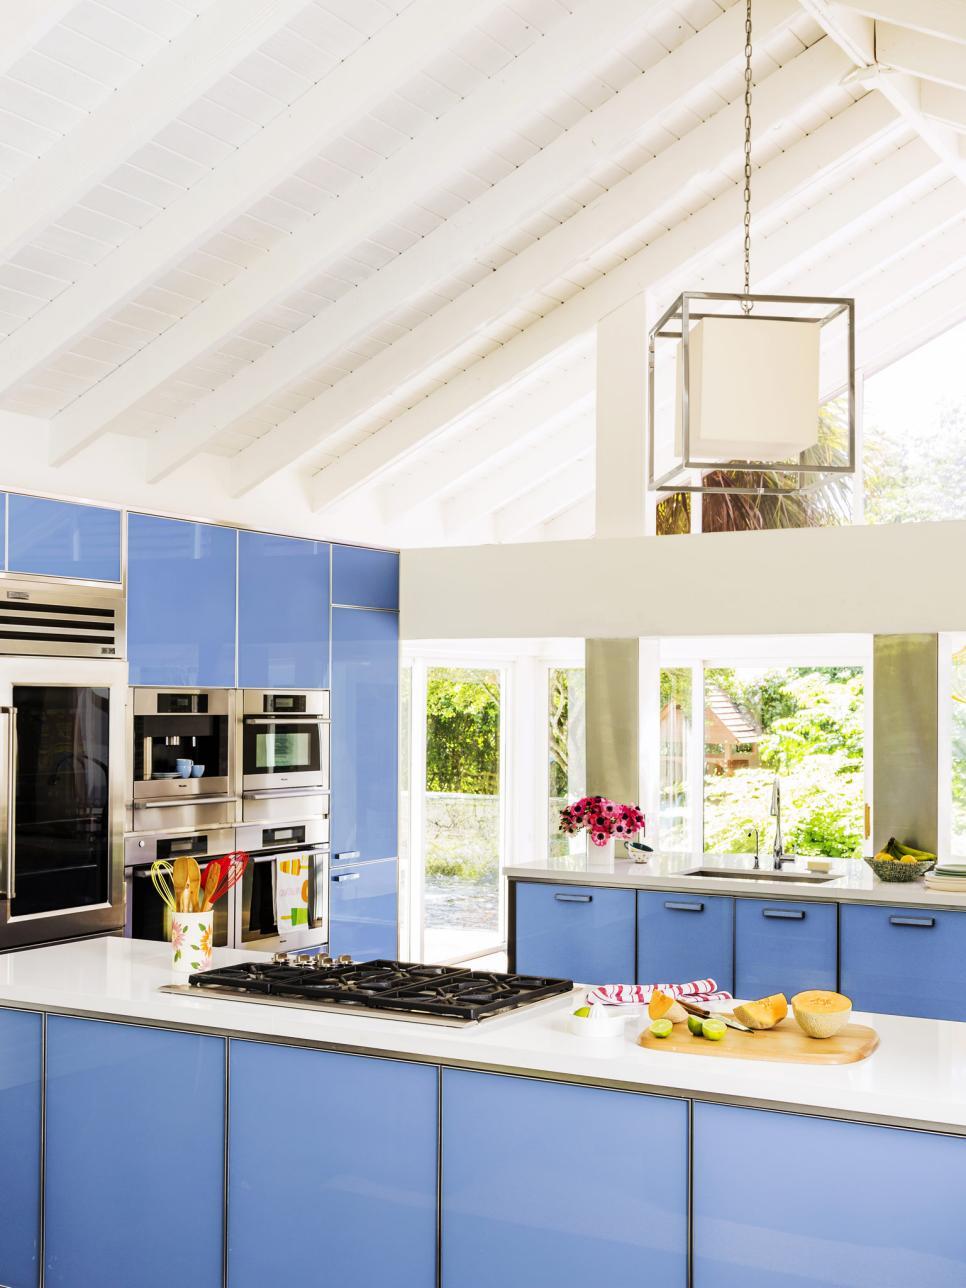 kitchen design ideas and colors photo - 7